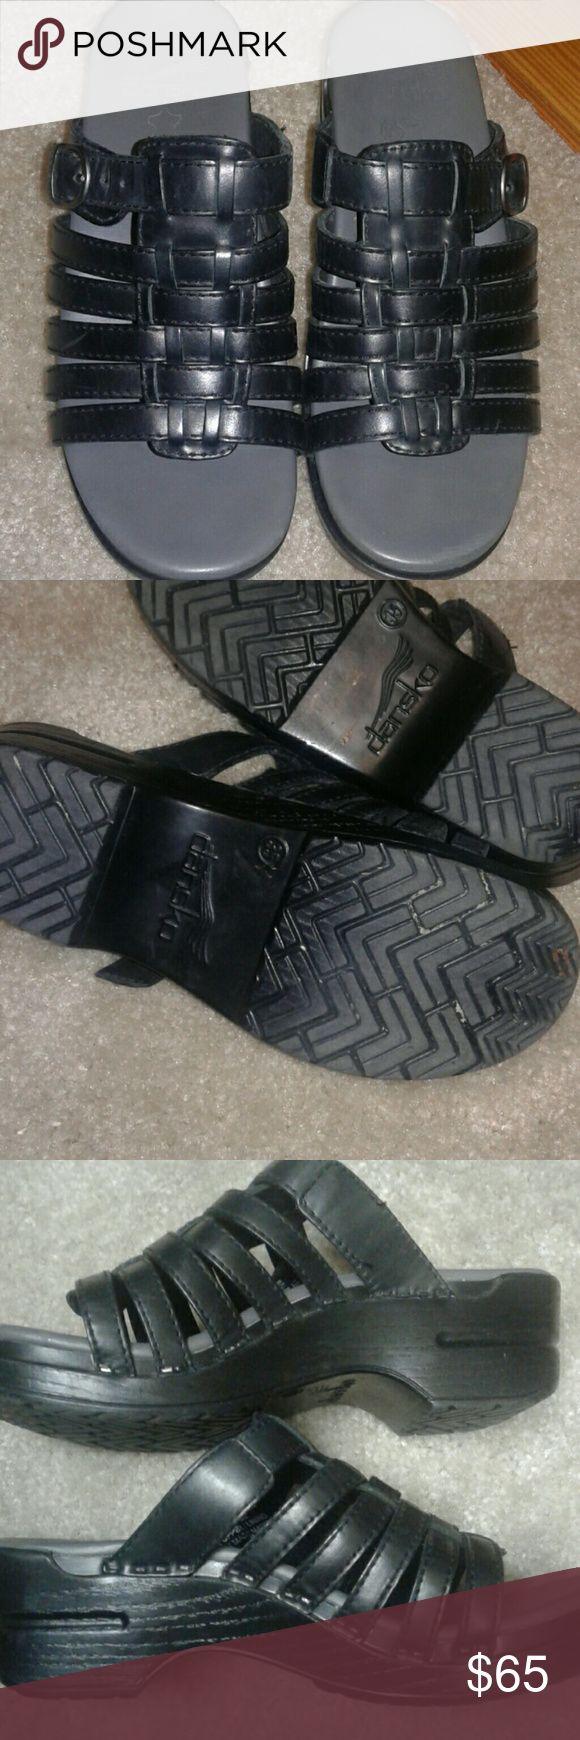 SALE $30.00 lowered NWOT Dansko sandles size 6. Perfect and shiney! Dansko Shoes Sandals